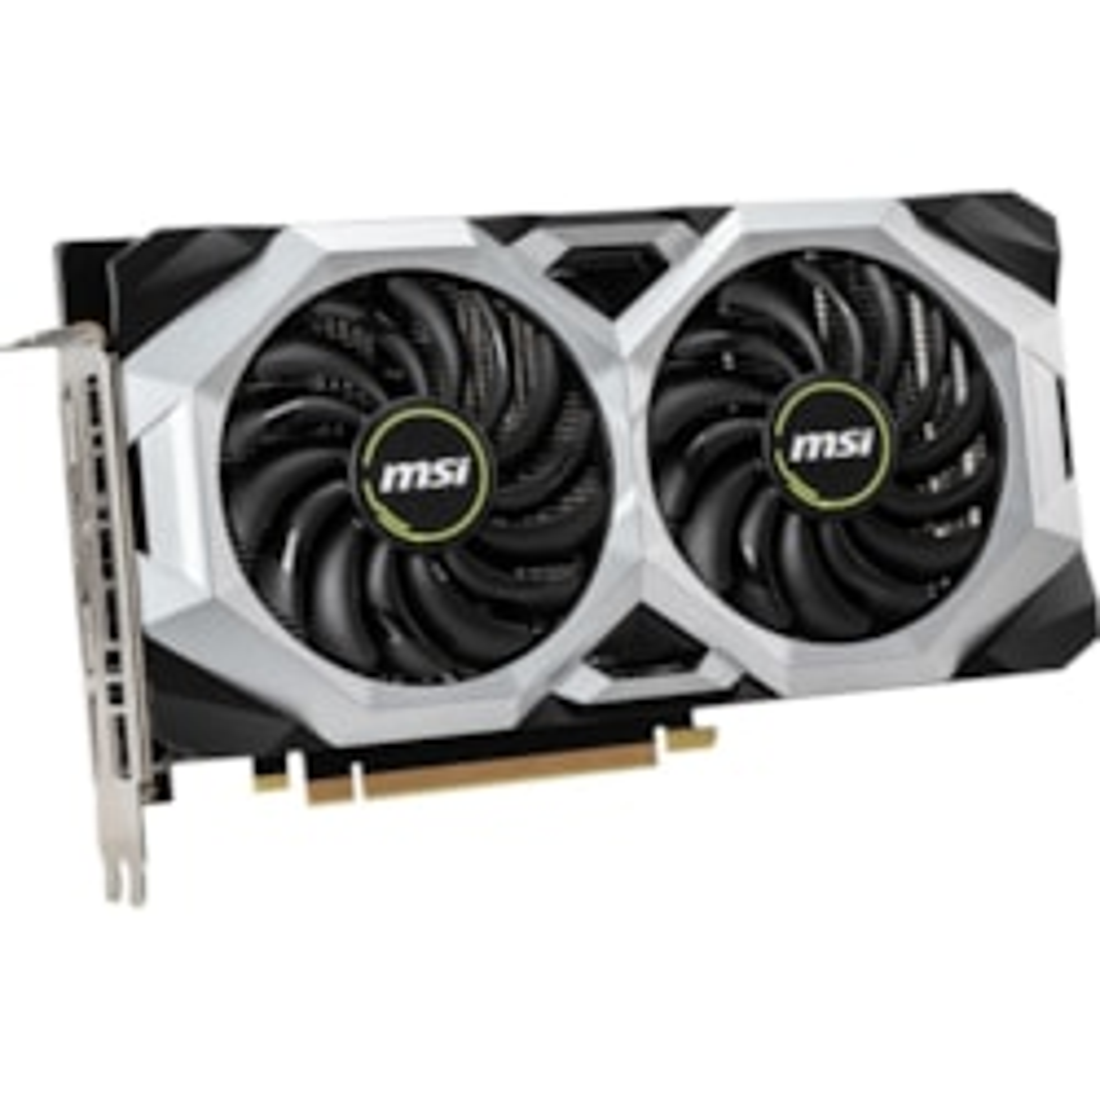 MSI VENTUS GEFORCE RTX 2060 SUPER VENTUS OC GeForce RTX 2060 SUPER Graphic Card - 8 GB GDDR6